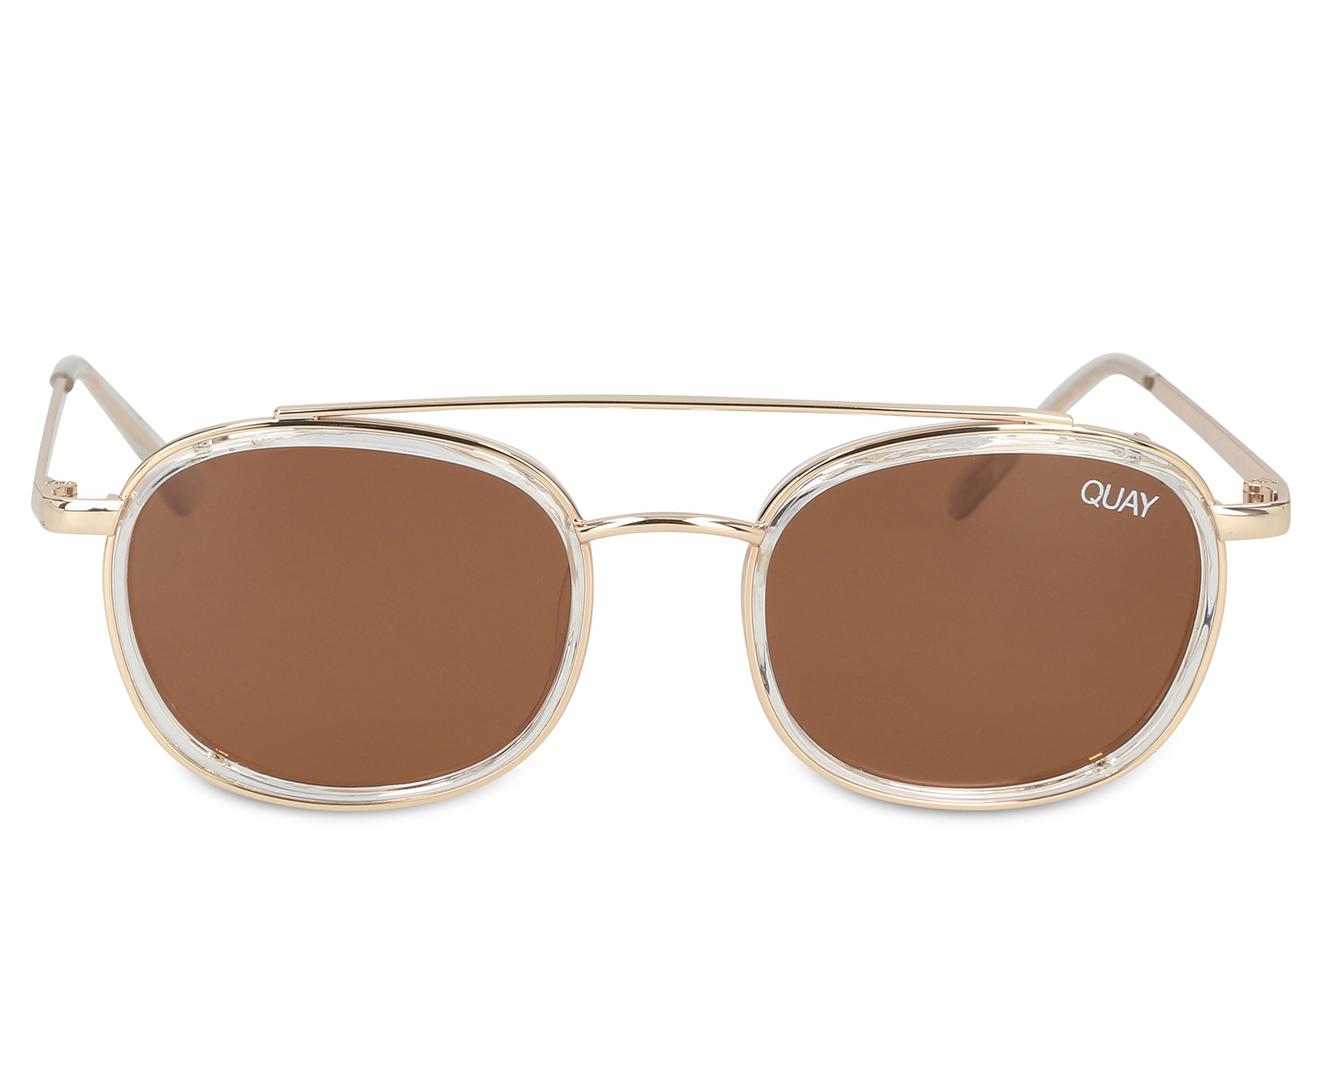 38b4b051b06de Quay Australia Got It Covered Polarised Sunglasses - Clear Brown ...